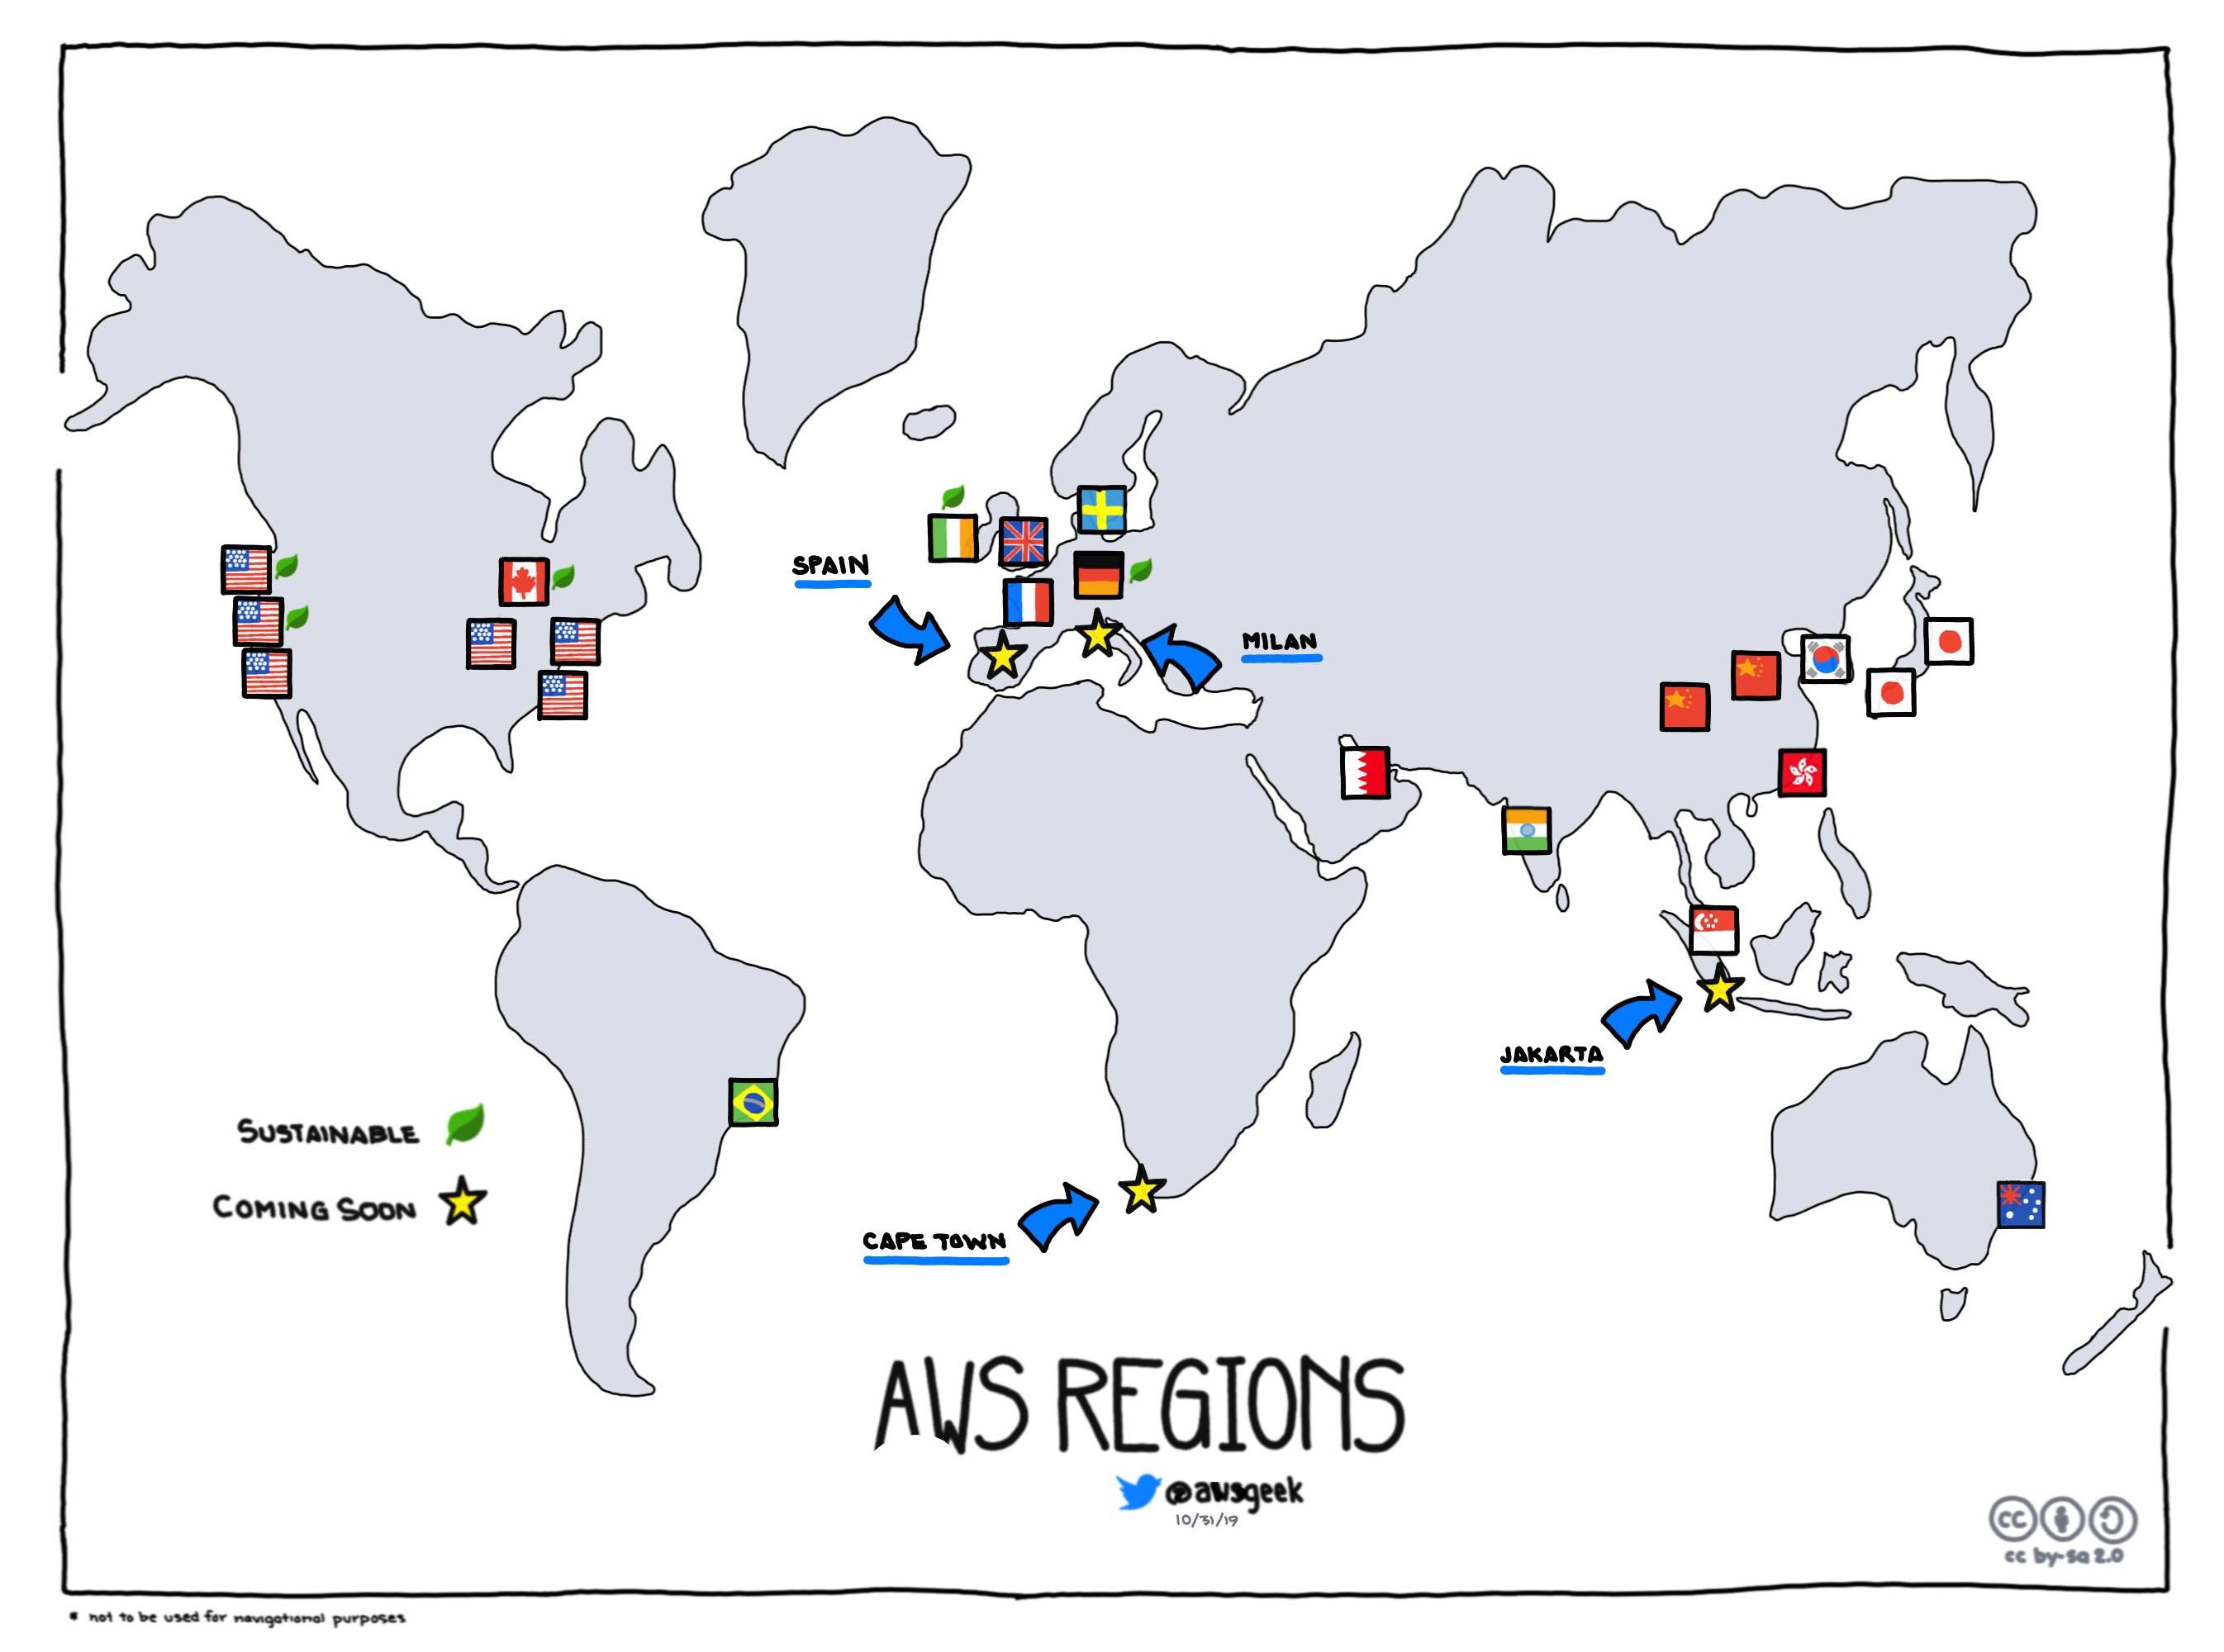 AWS regions. The green leaf means green power. Source: https://www.awsgeek.com/AWS-Regions/index.html